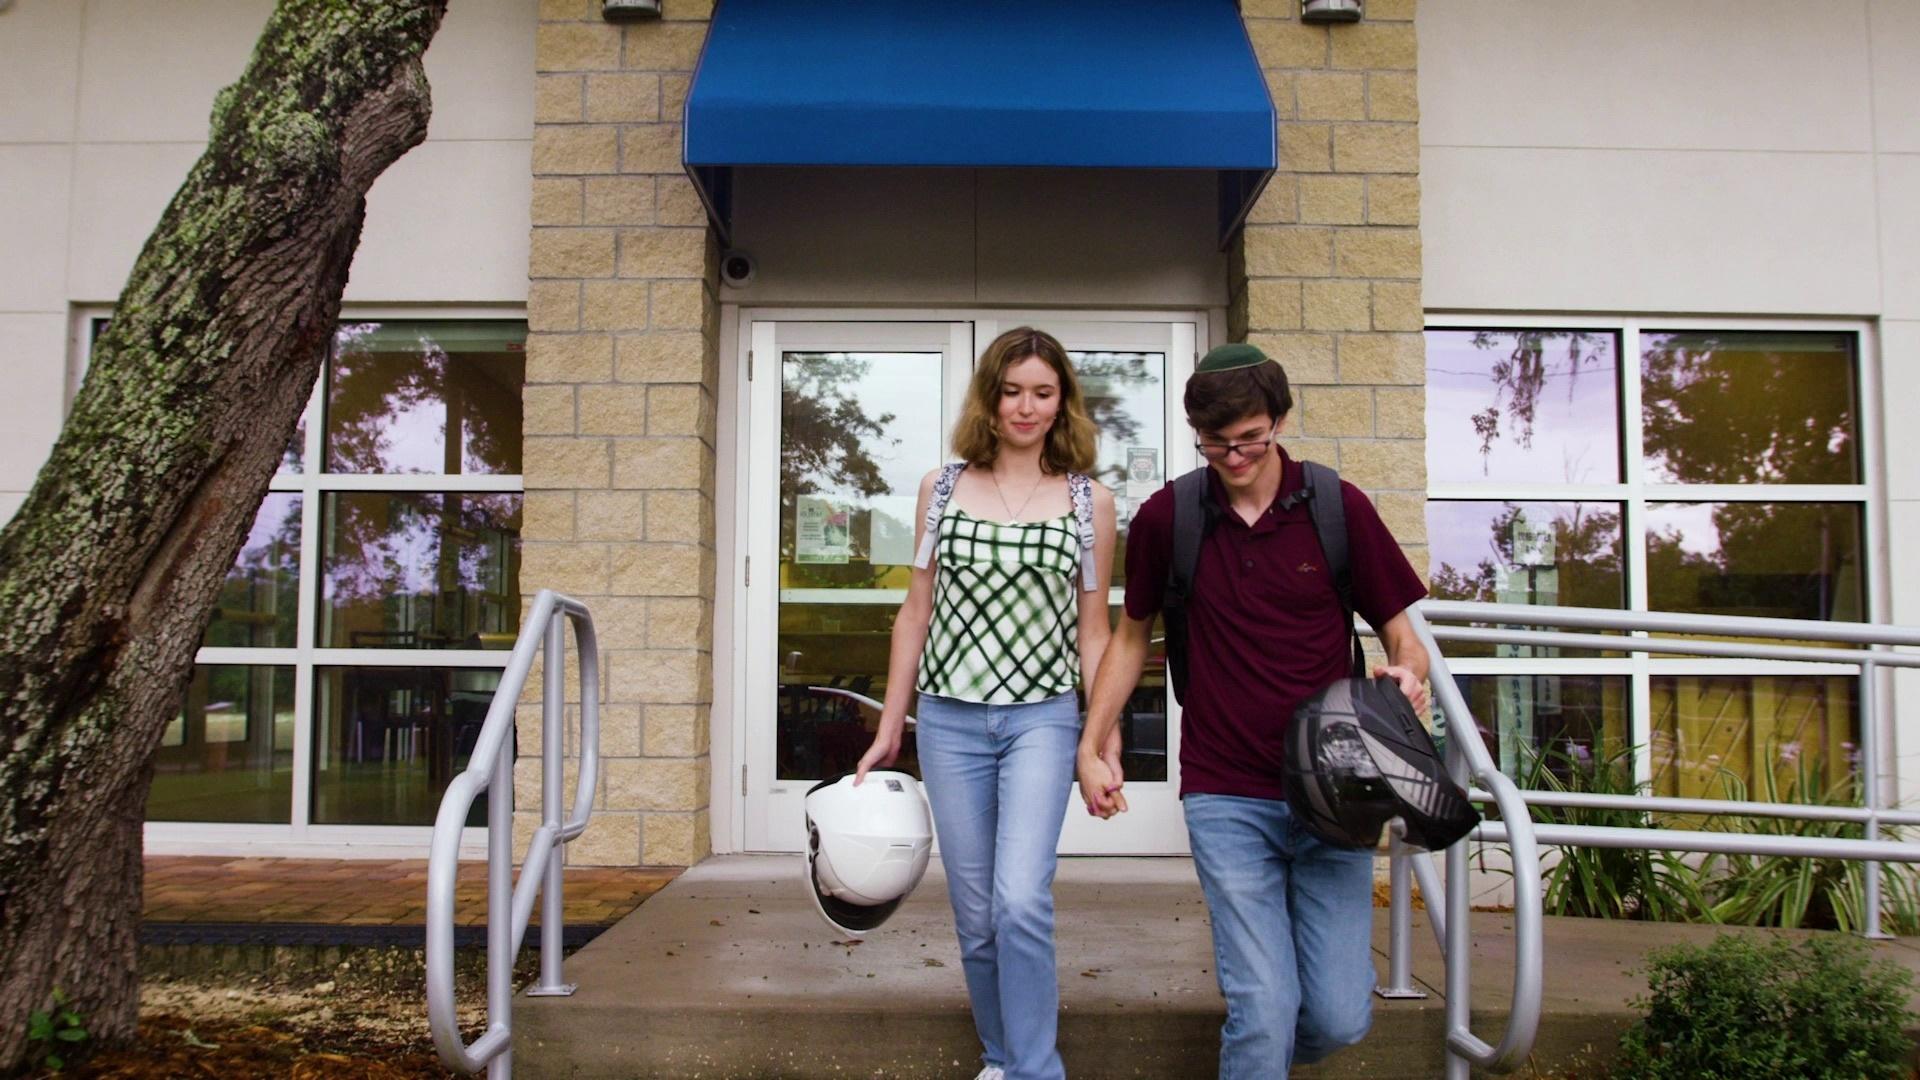 Jewish Life on College Campuses